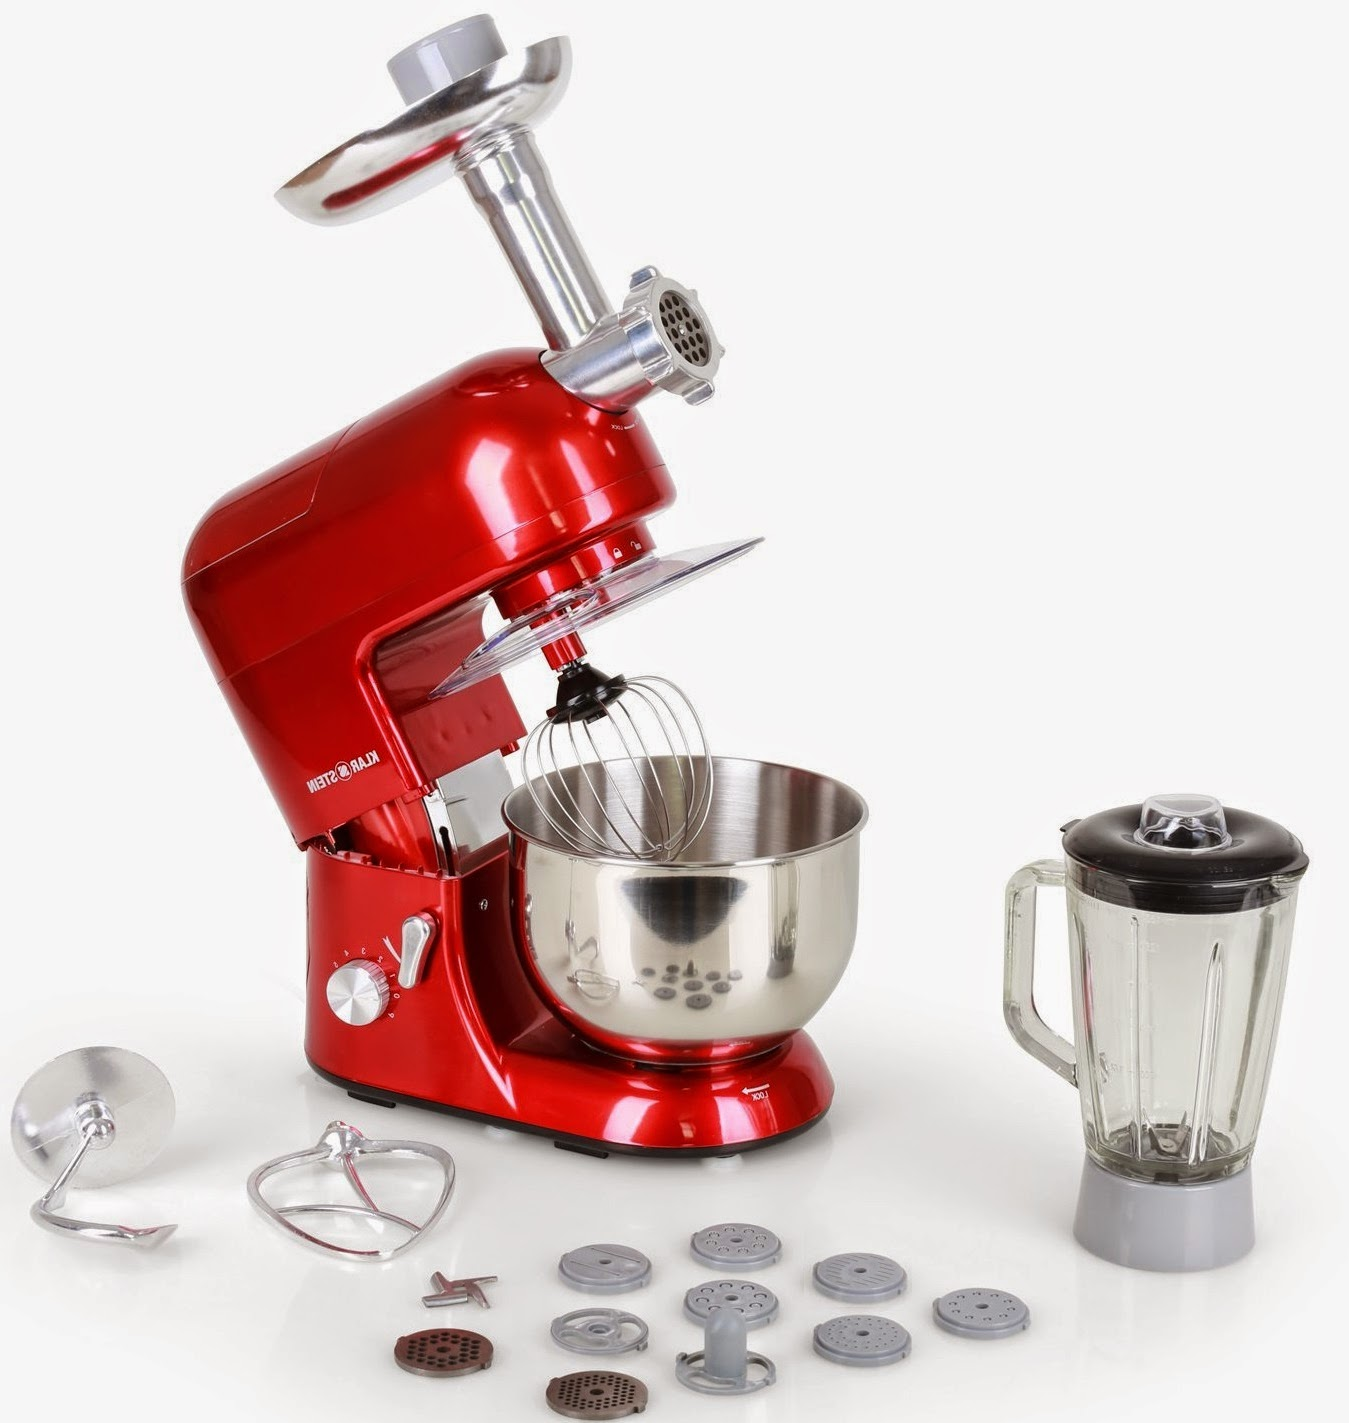 les mostramos las mejores maquinas de cocina robots de